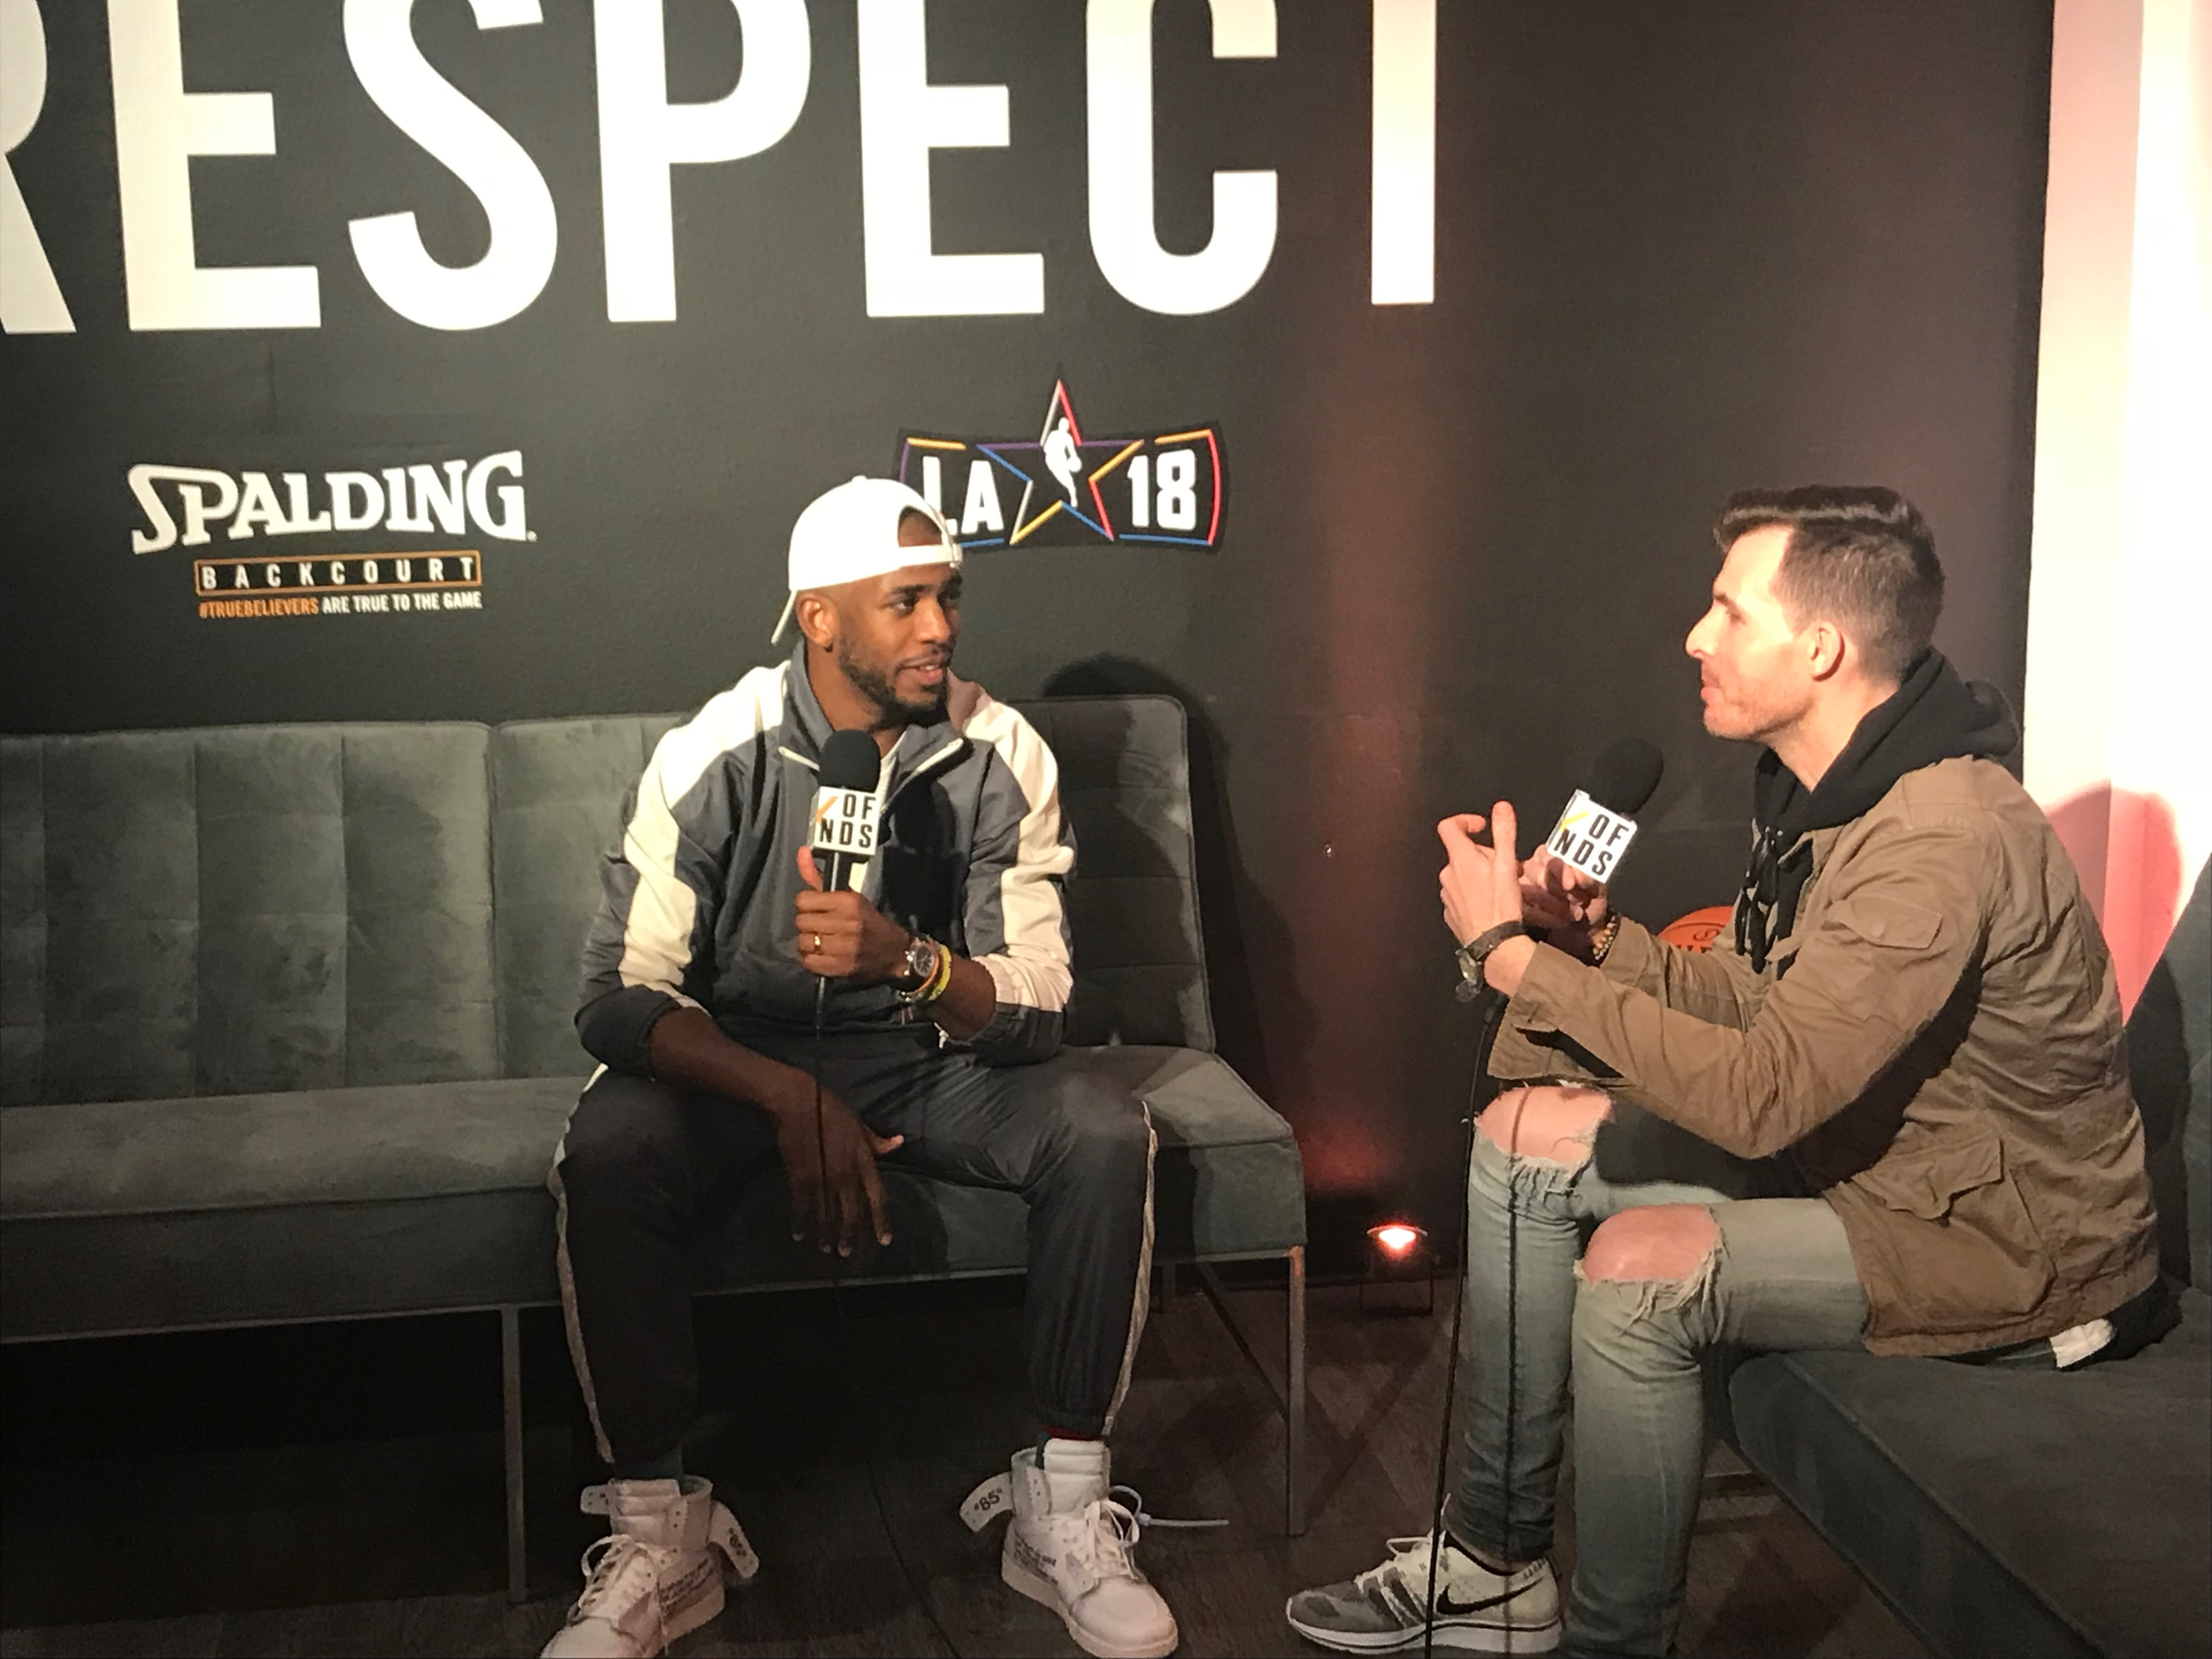 Chris Paul Spalding Backcourt 2018 NBA All-Star